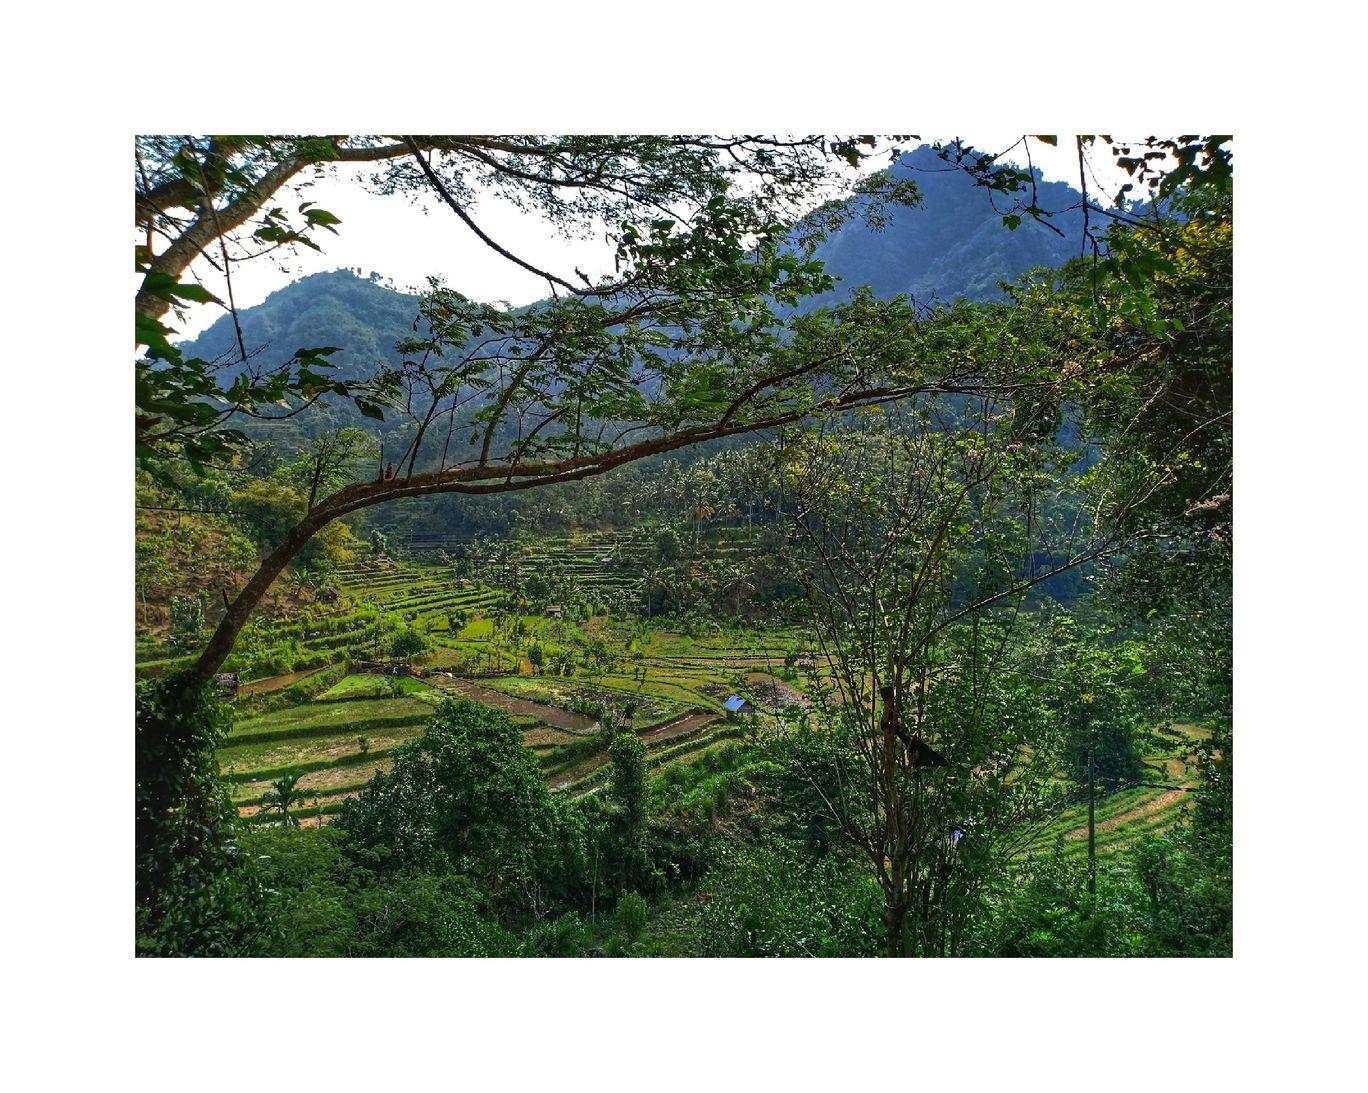 Photo of Bali By Kiran Menon